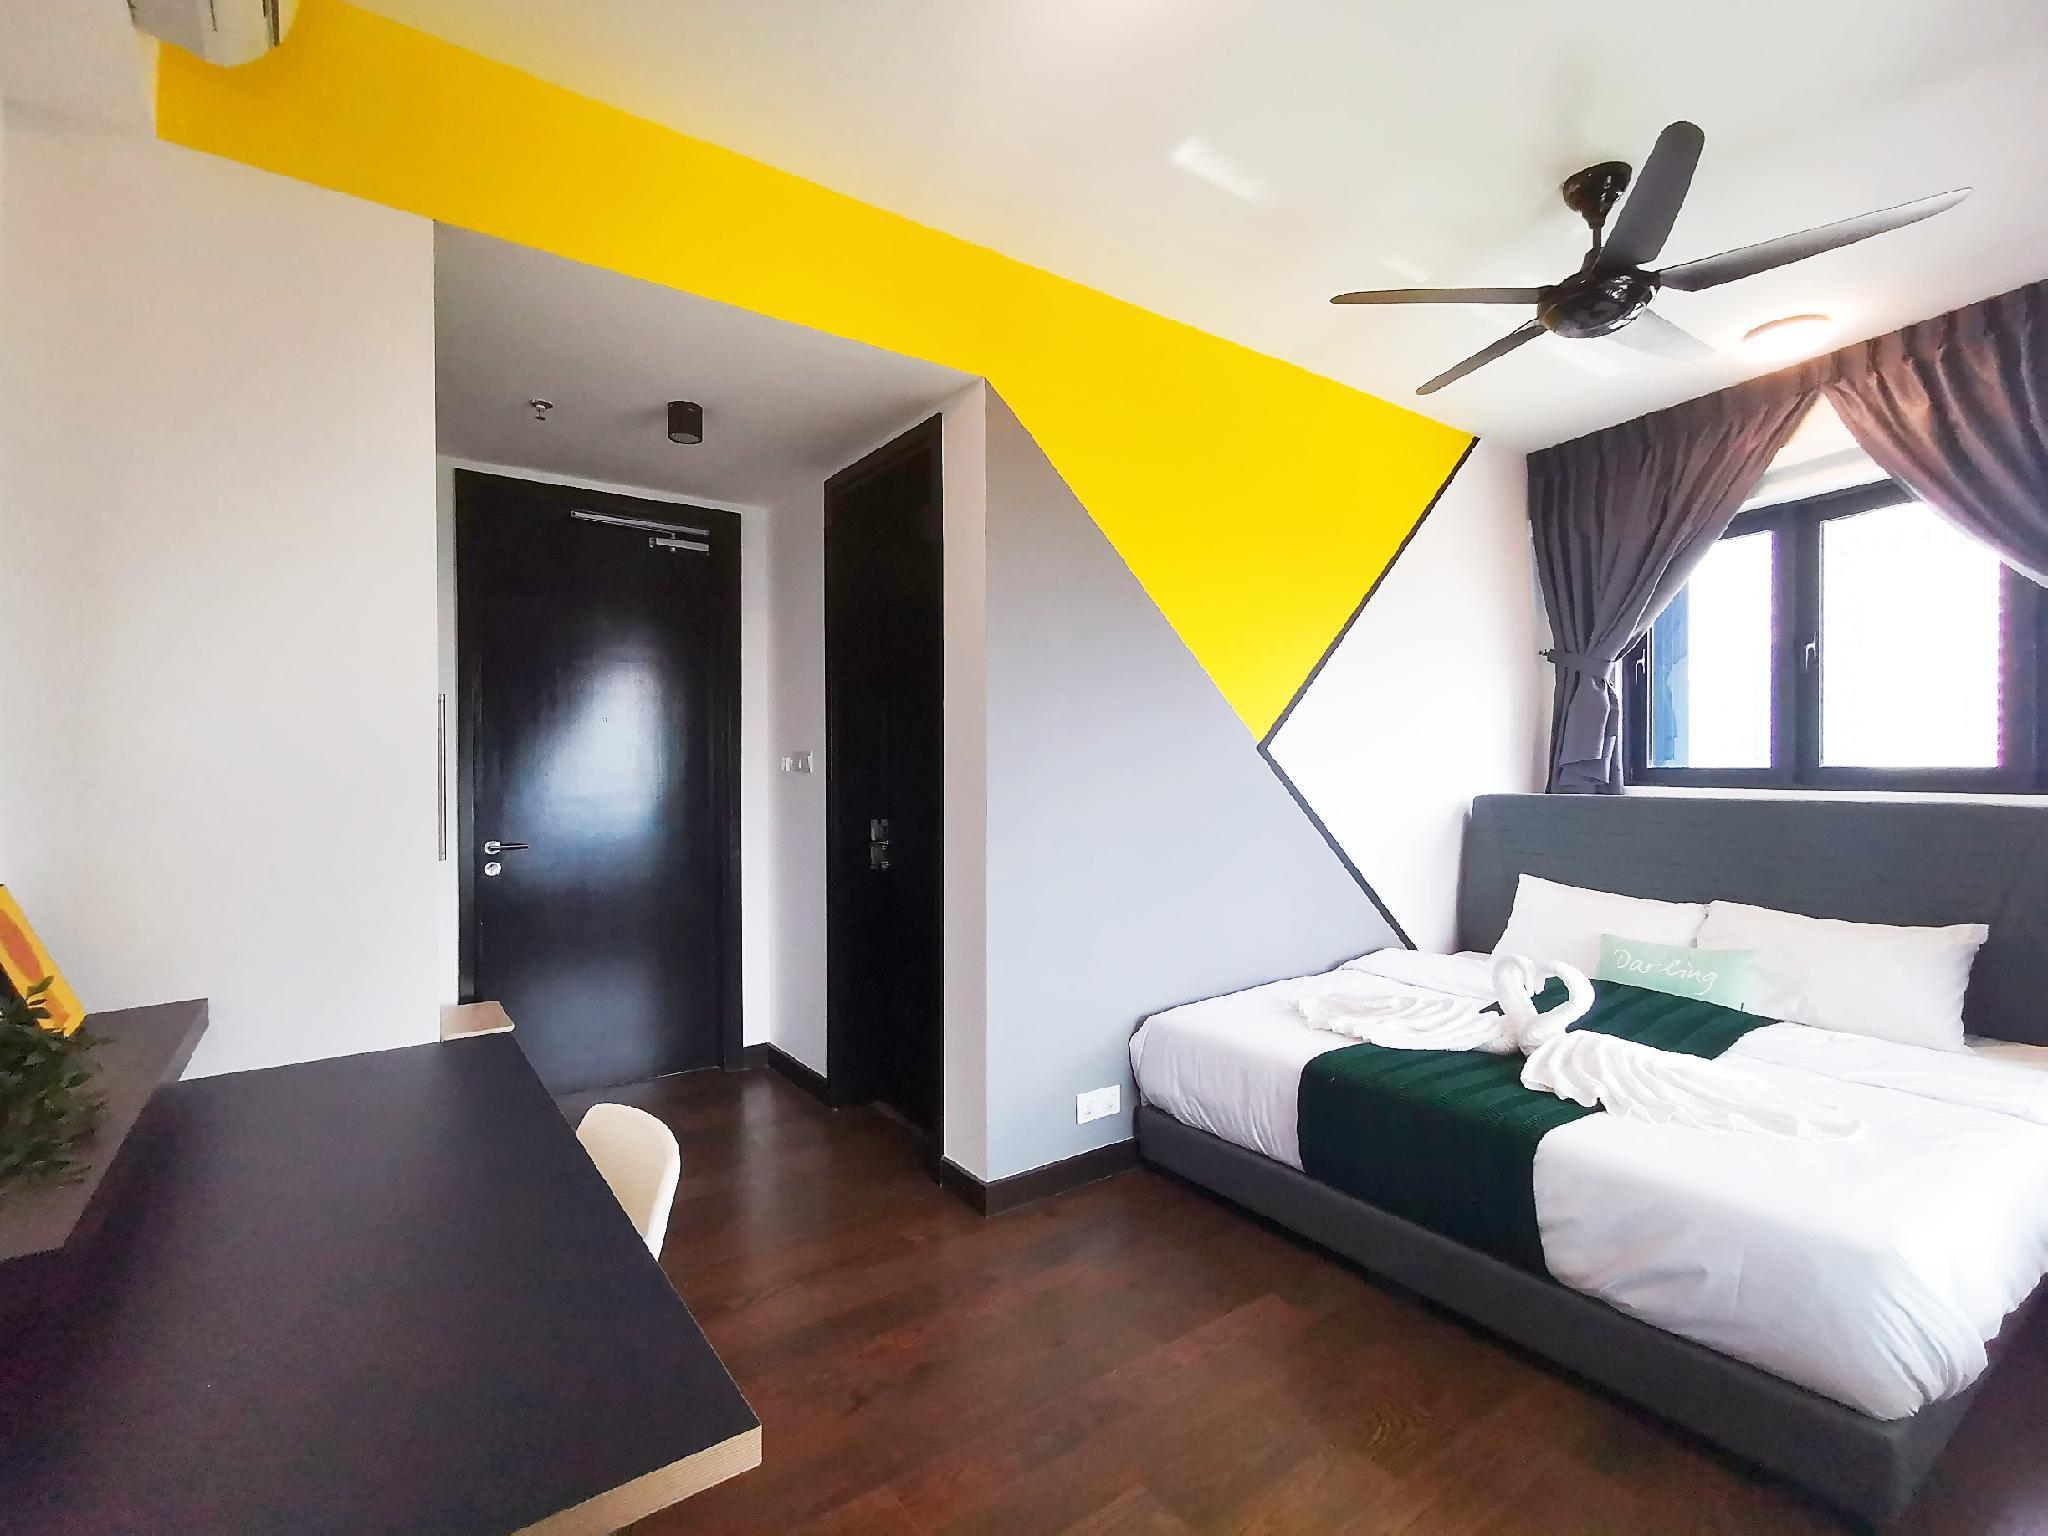 Almas Duplex 4pax  WIFI C1106  @ JB City Home